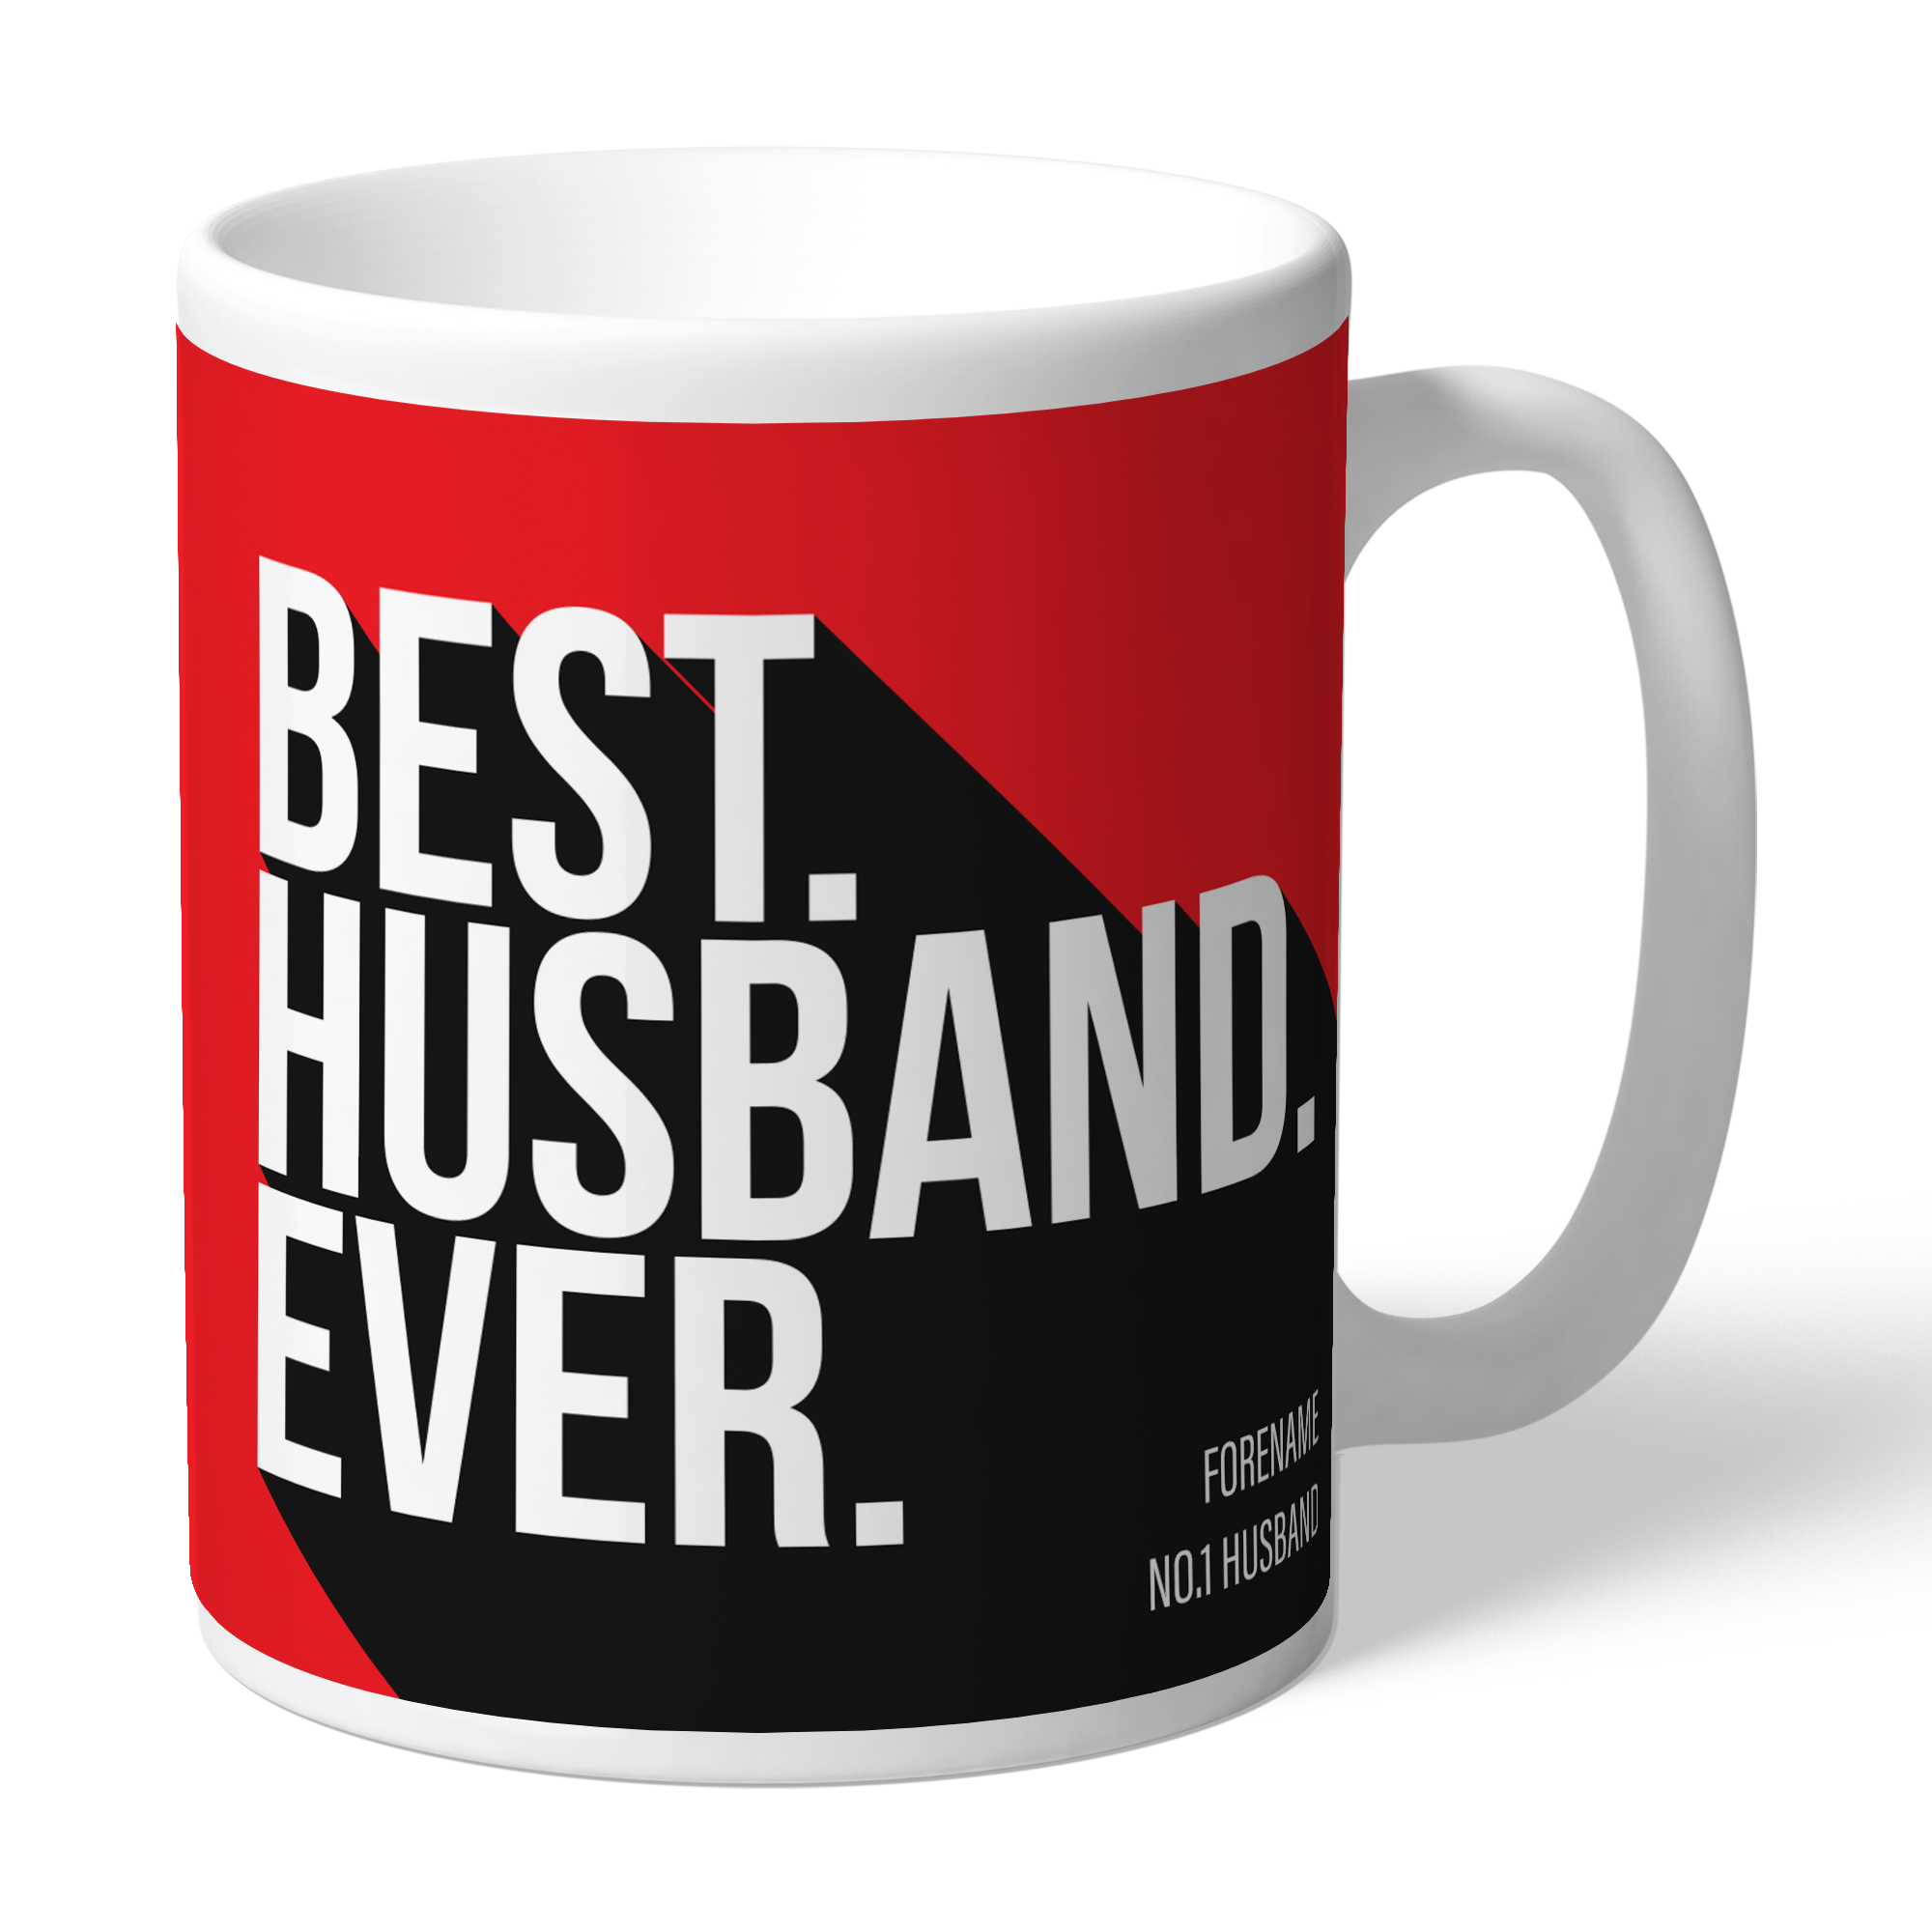 Sheffield United Best Husband Ever Mug